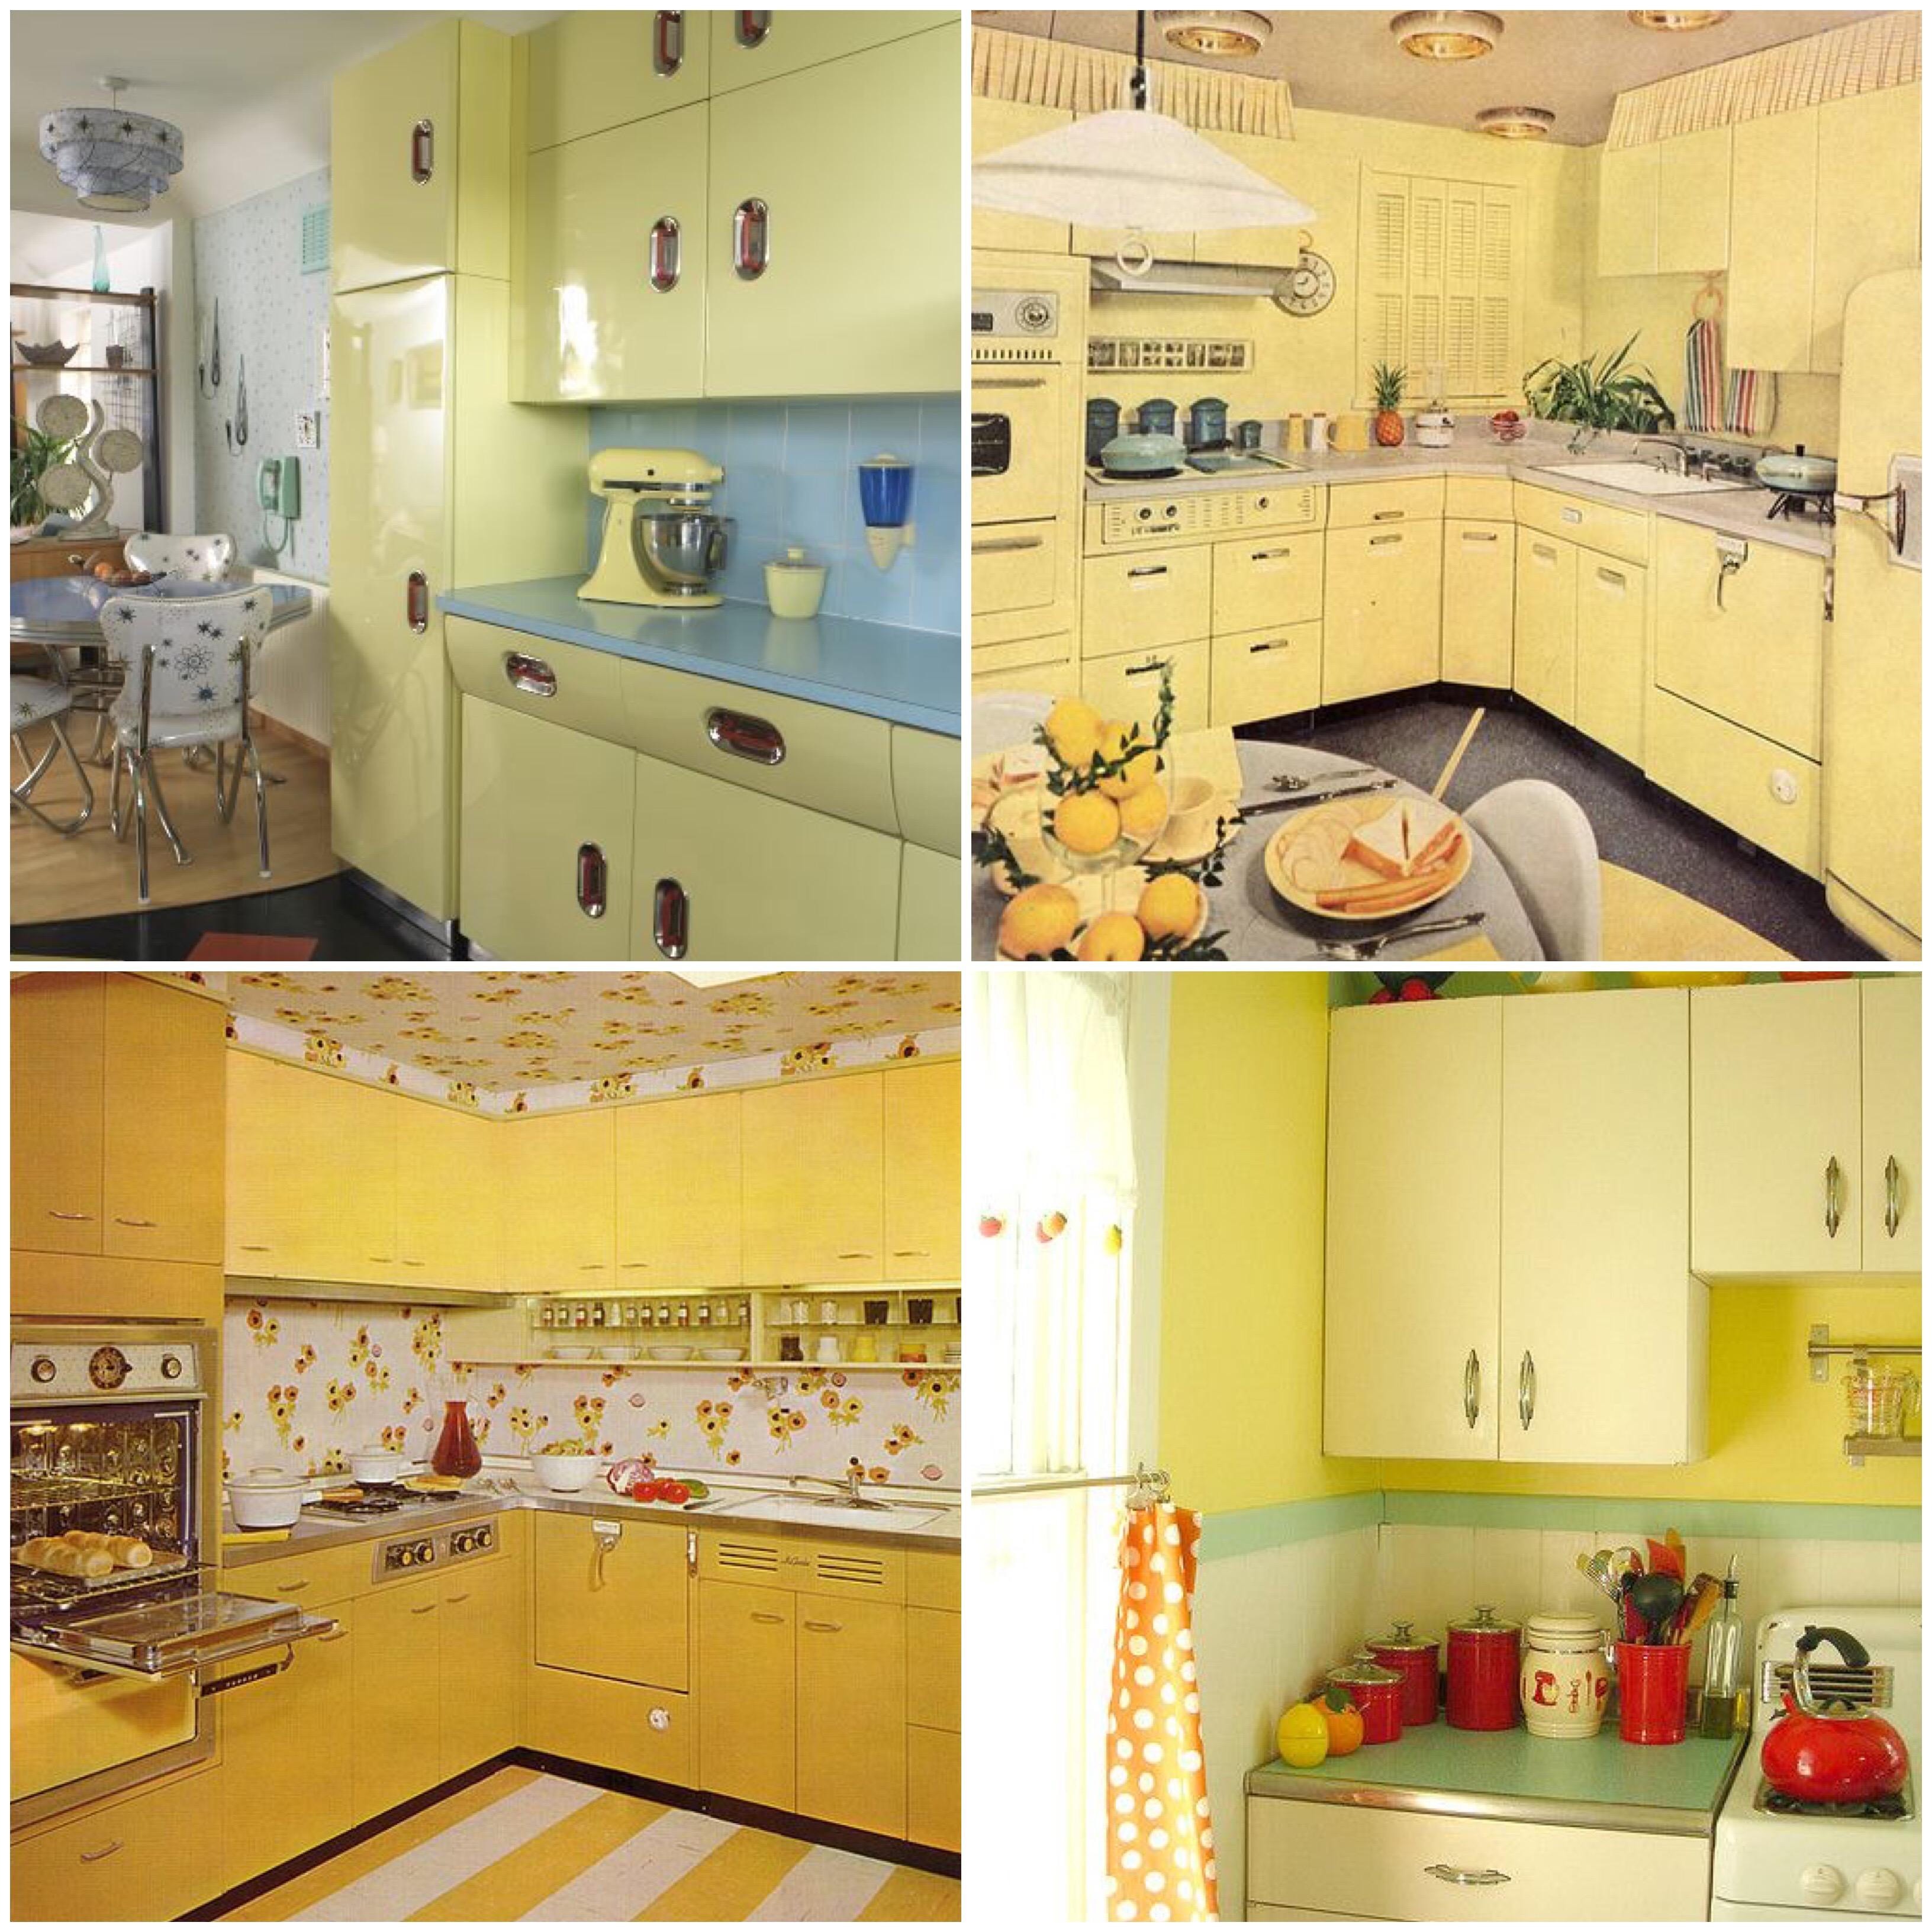 Rainbow Kitchen Decor: Taste The Rainbow: Vintage Kitchens Of Every Shade